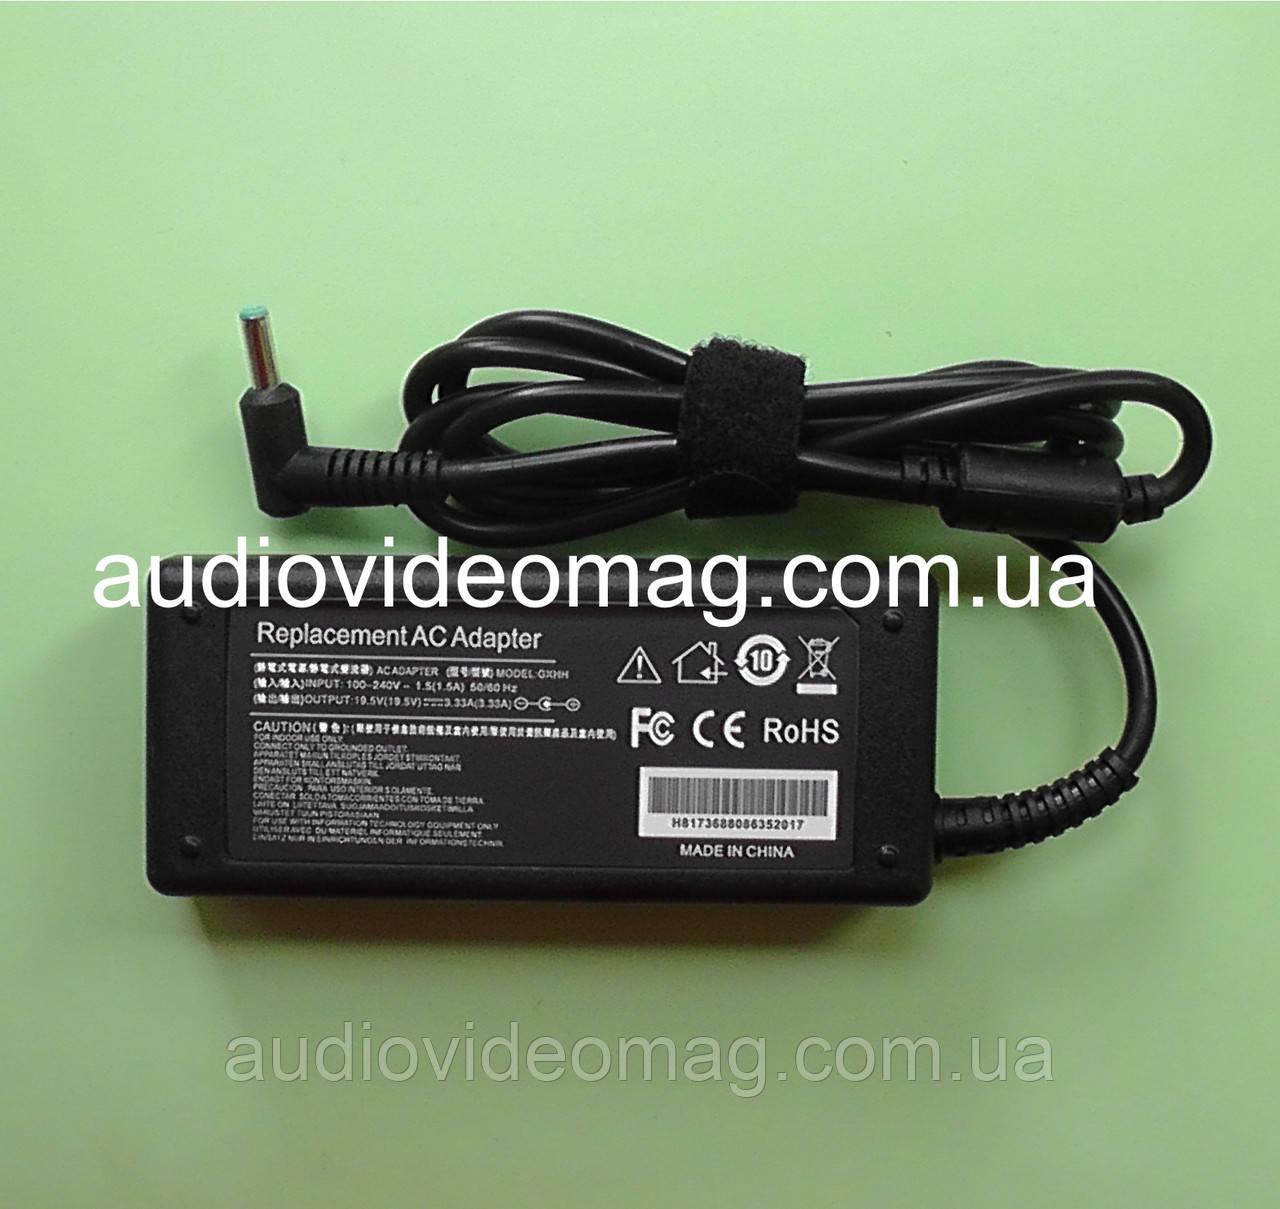 Блок питания 19.5V 3.33A (штекер 4.5-3.0 c штырьком) для ноутбуков HP (Hewlett Packard)